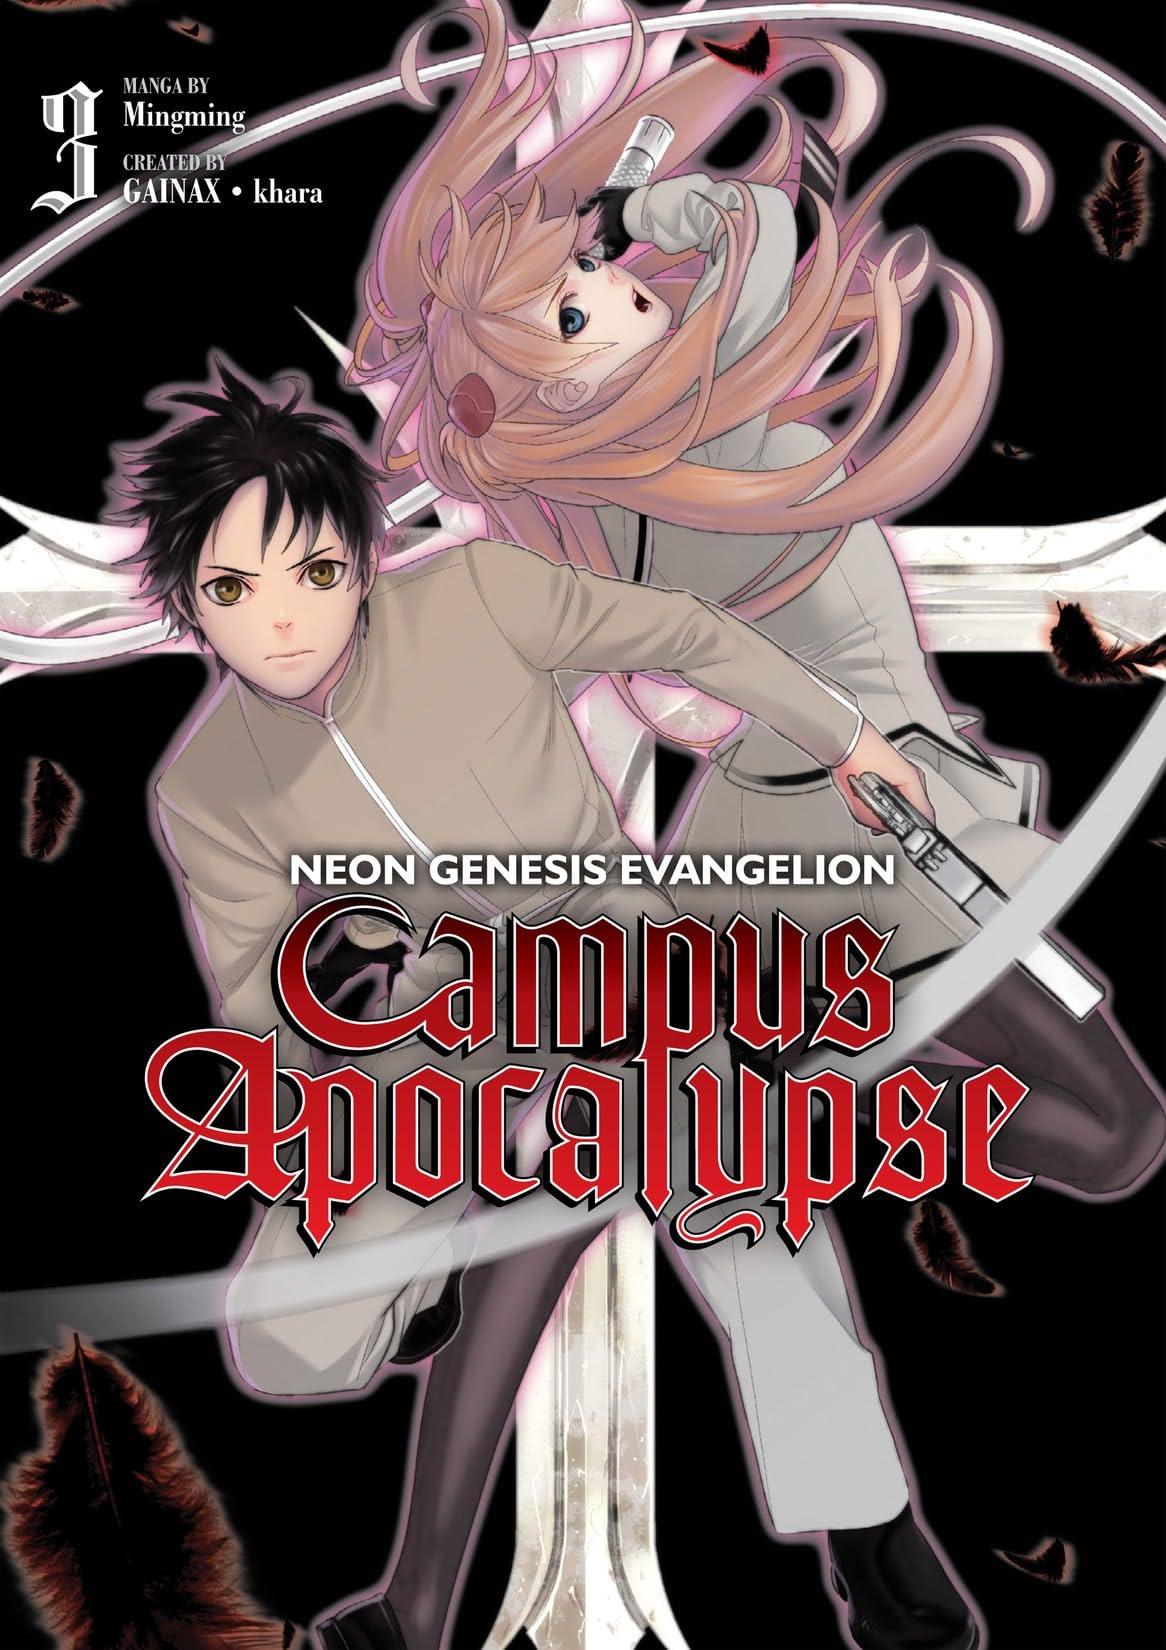 Neon Genesis Evangelion: Campus Apocalypse Vol. 3